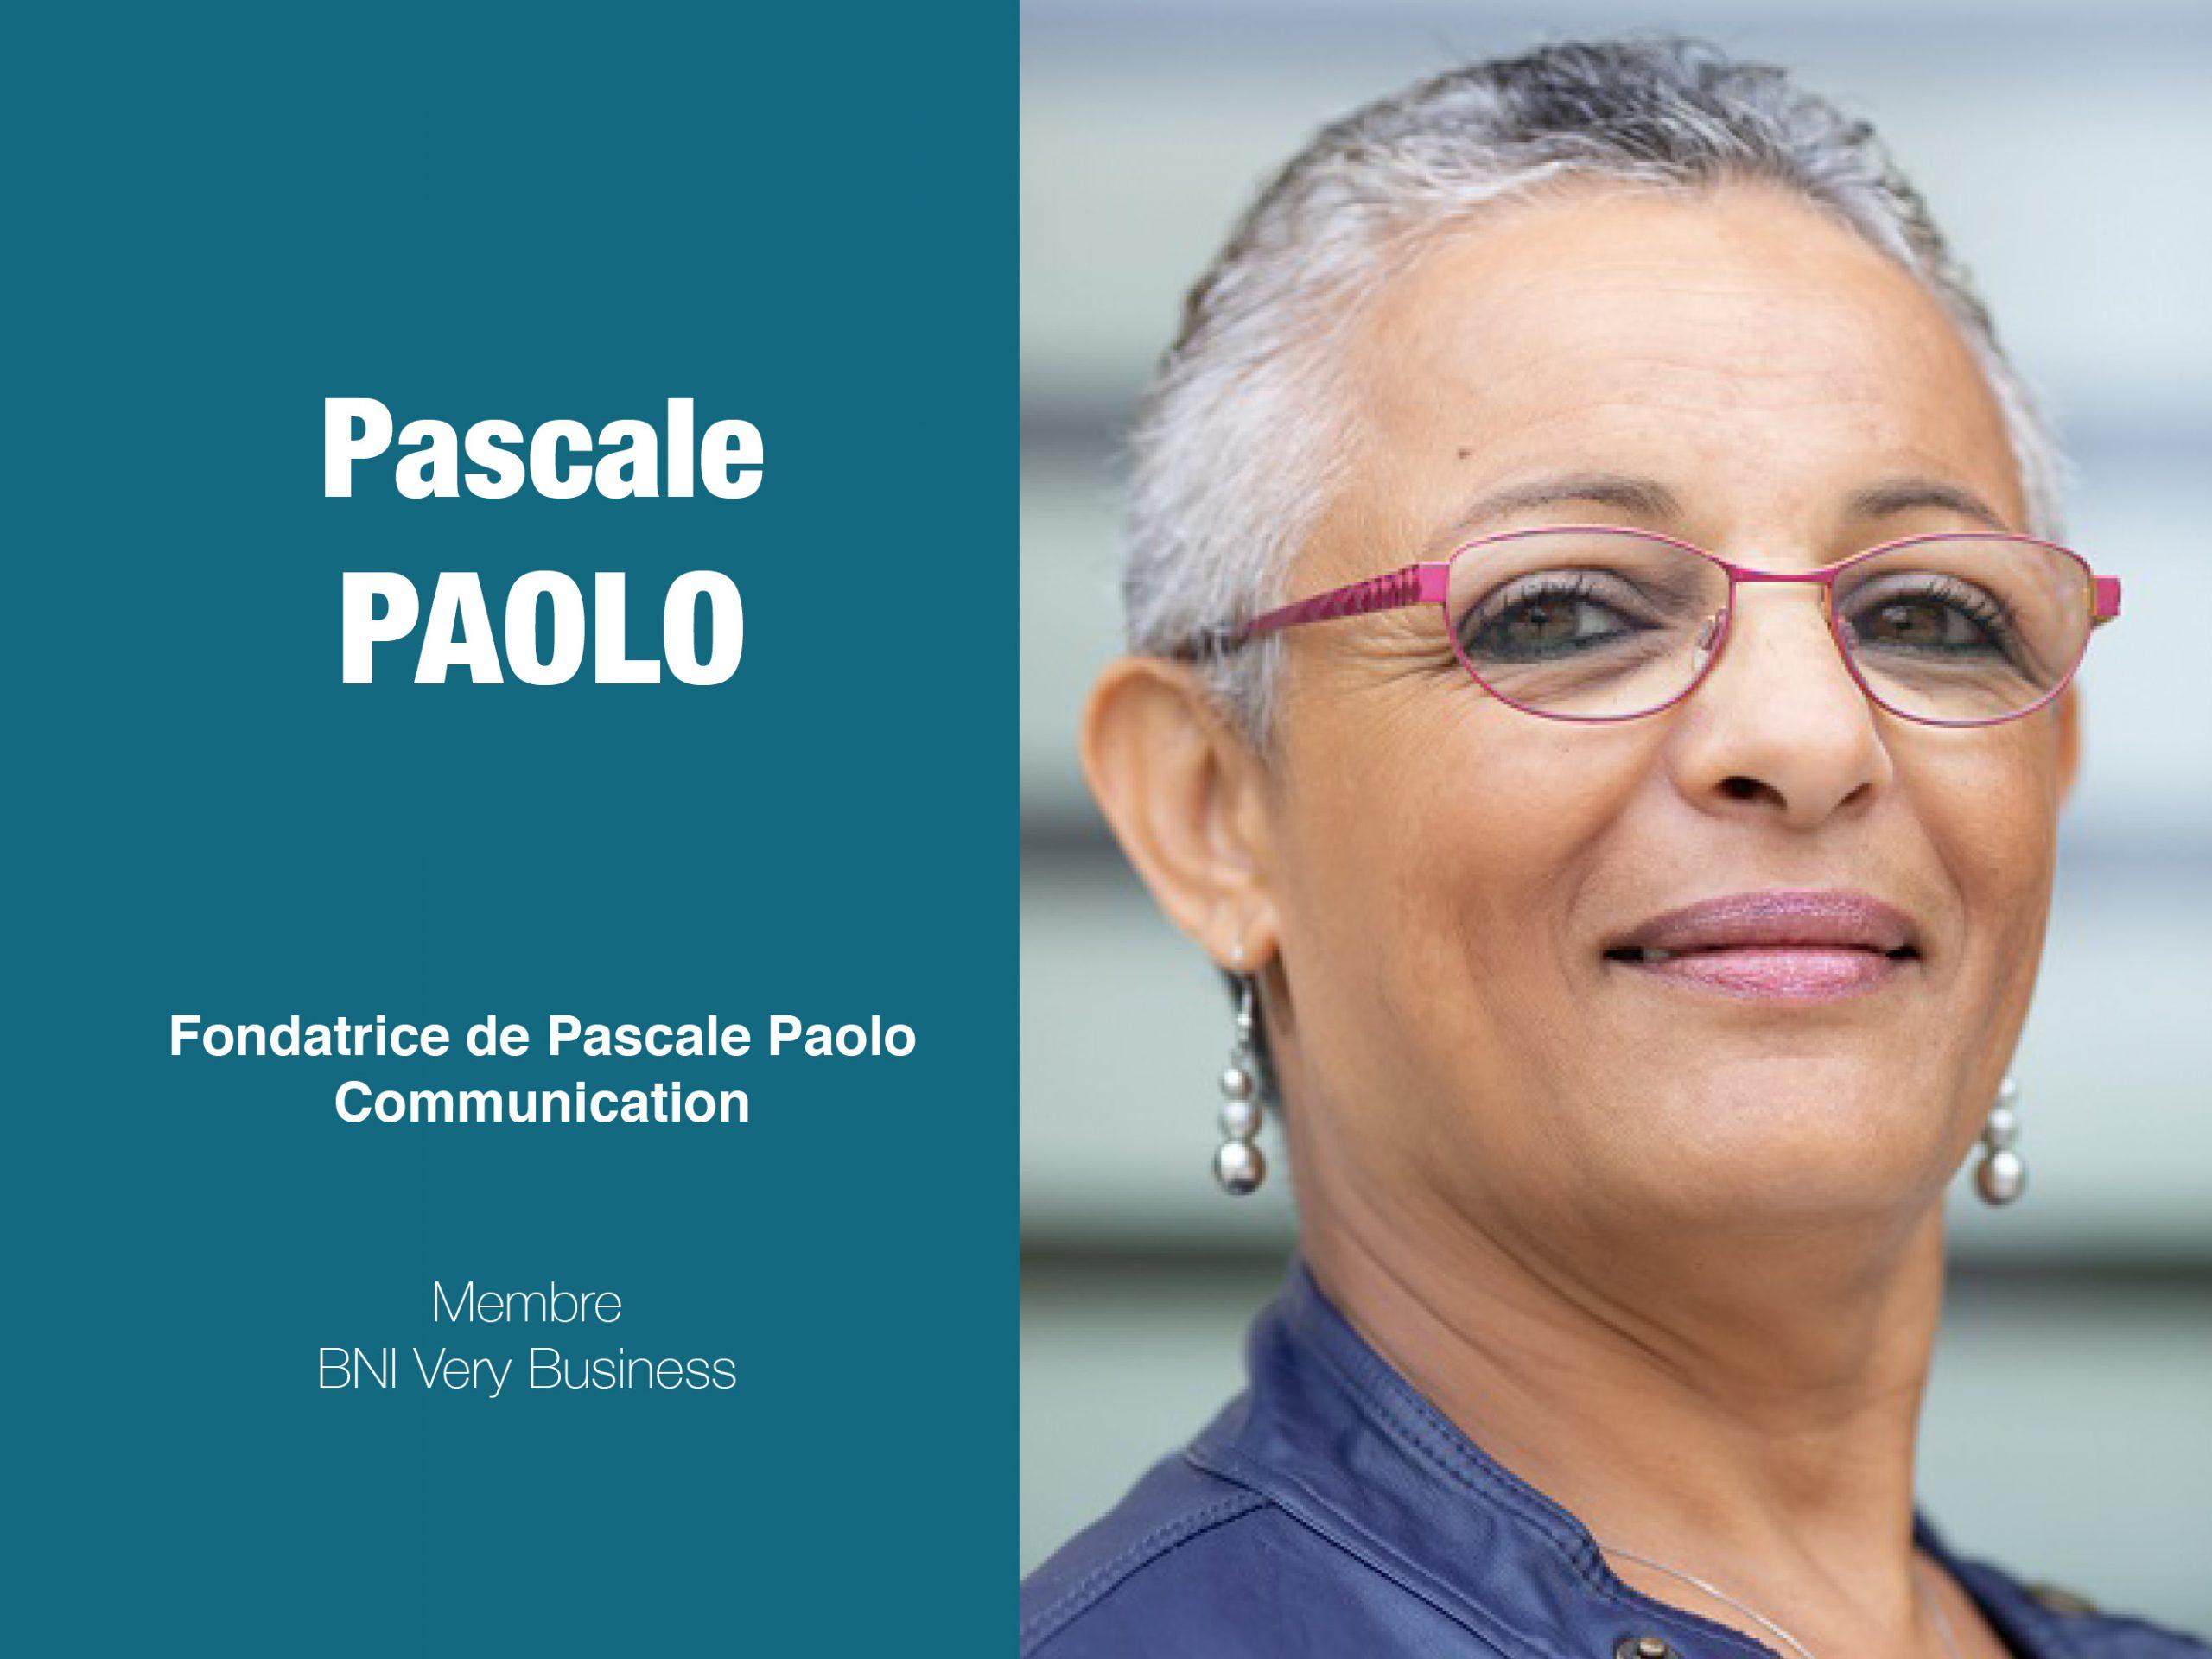 Pascale PAOLO BNI Very Business